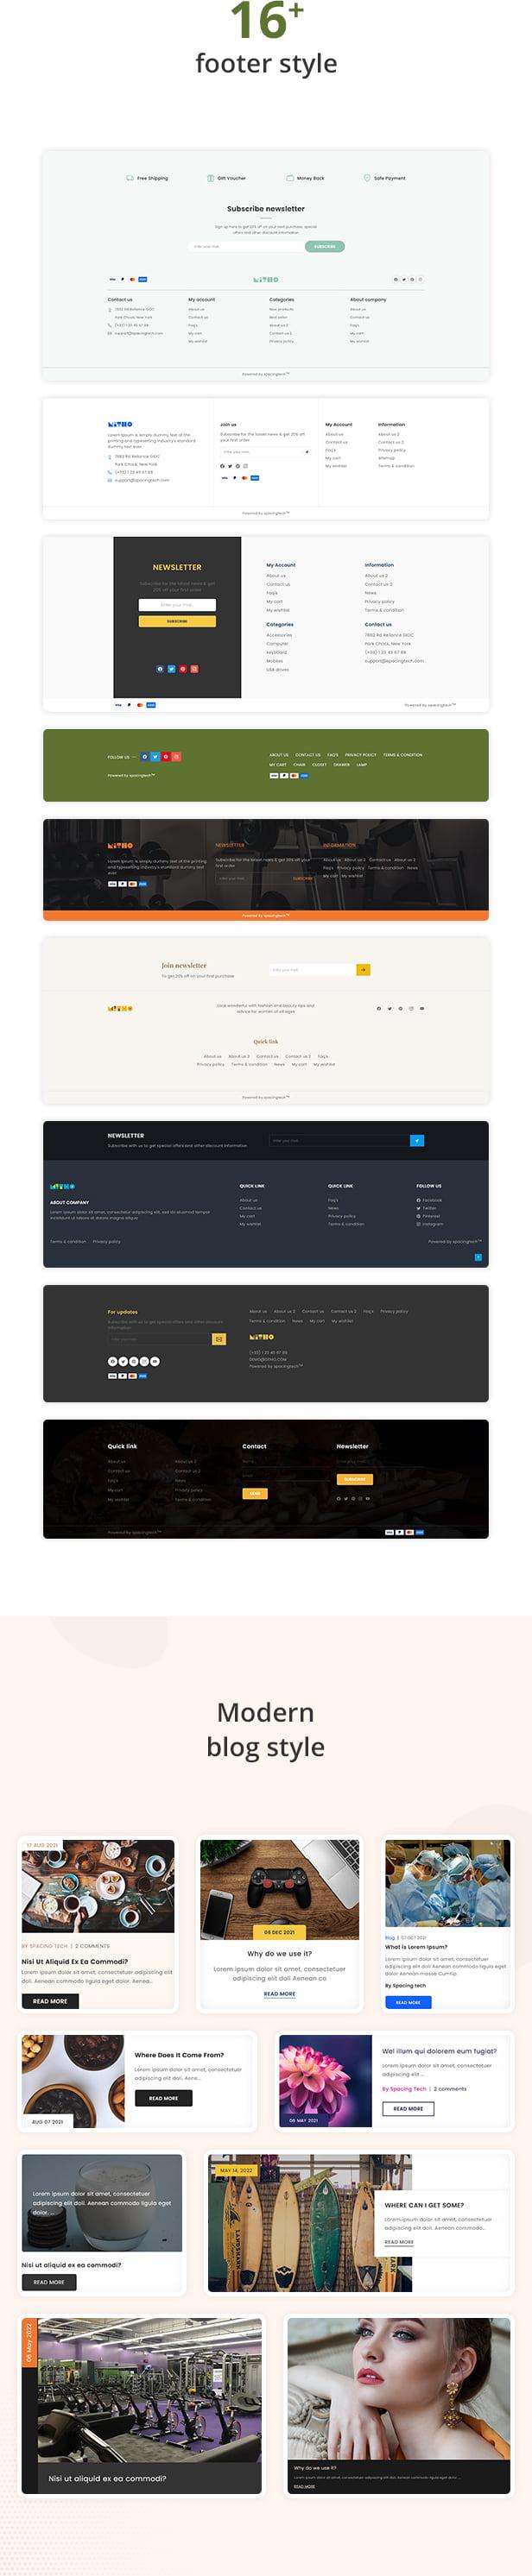 Mitho - Multipurpose beauty, medical, foods shopify theme - 10